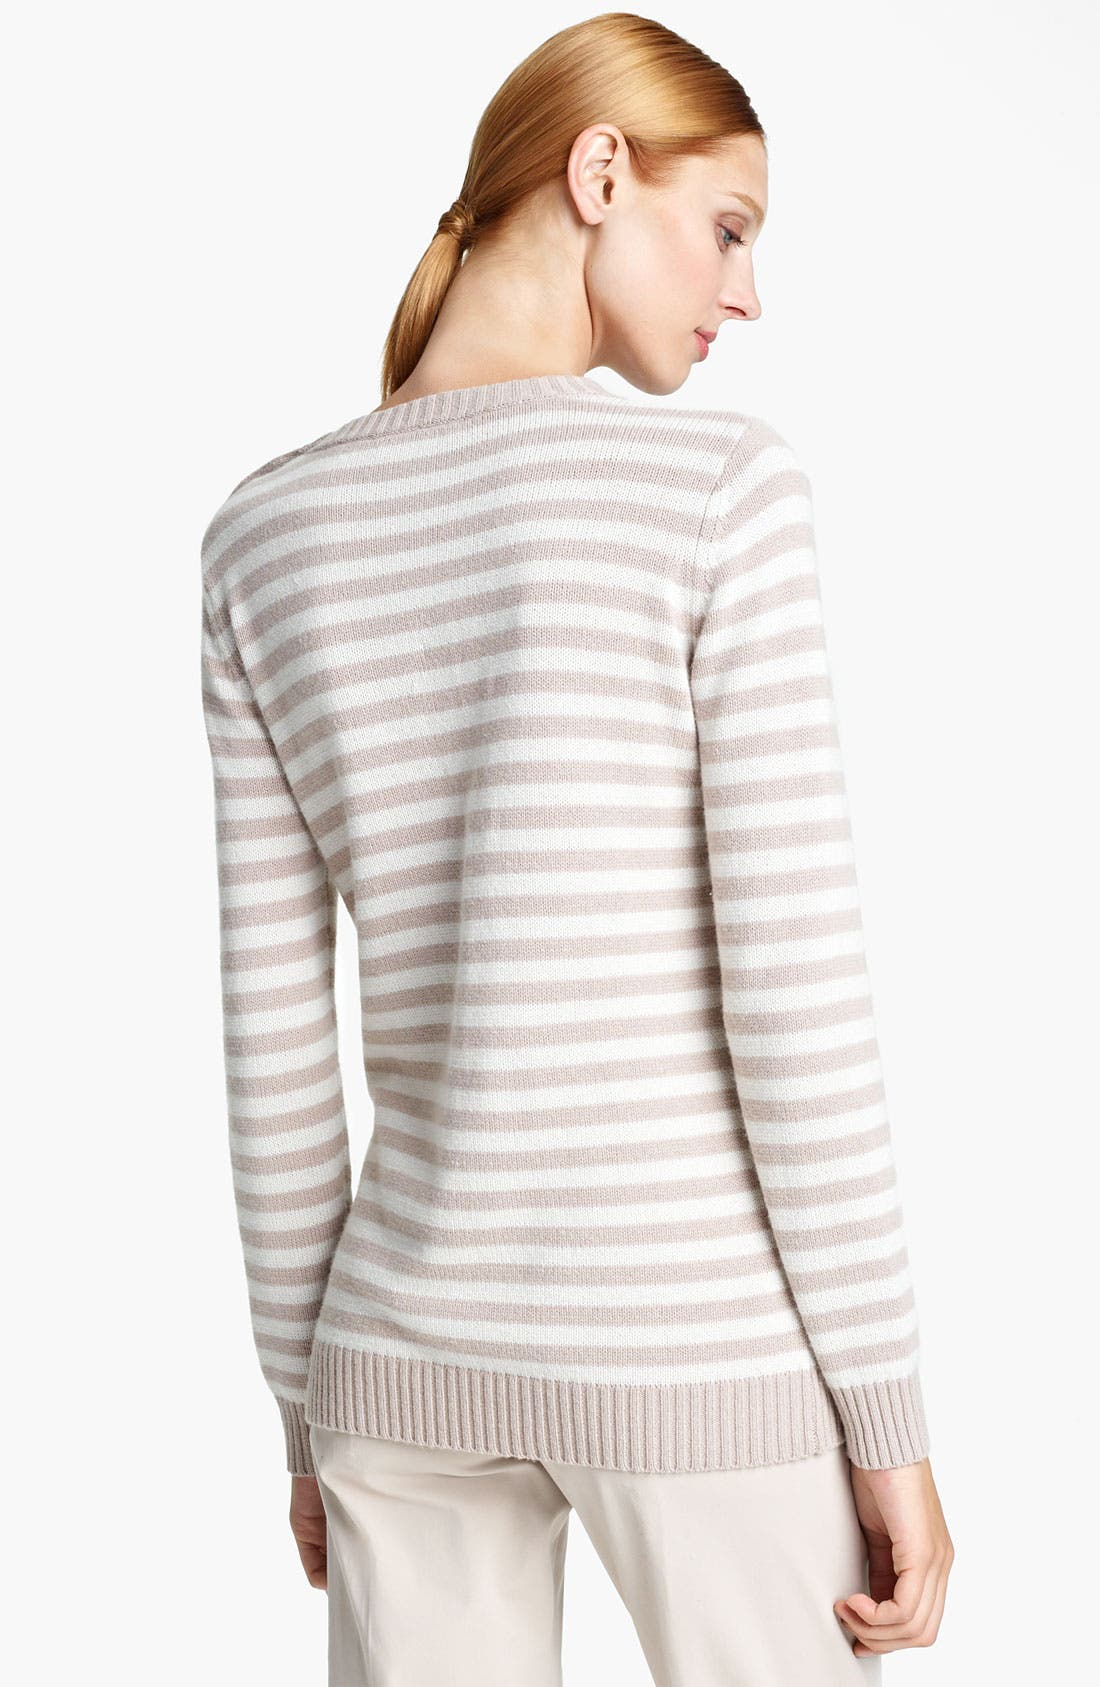 Alternate Image 2  - Max Mara 'Auronzo' Striped Cashmere & Cotton Sweater